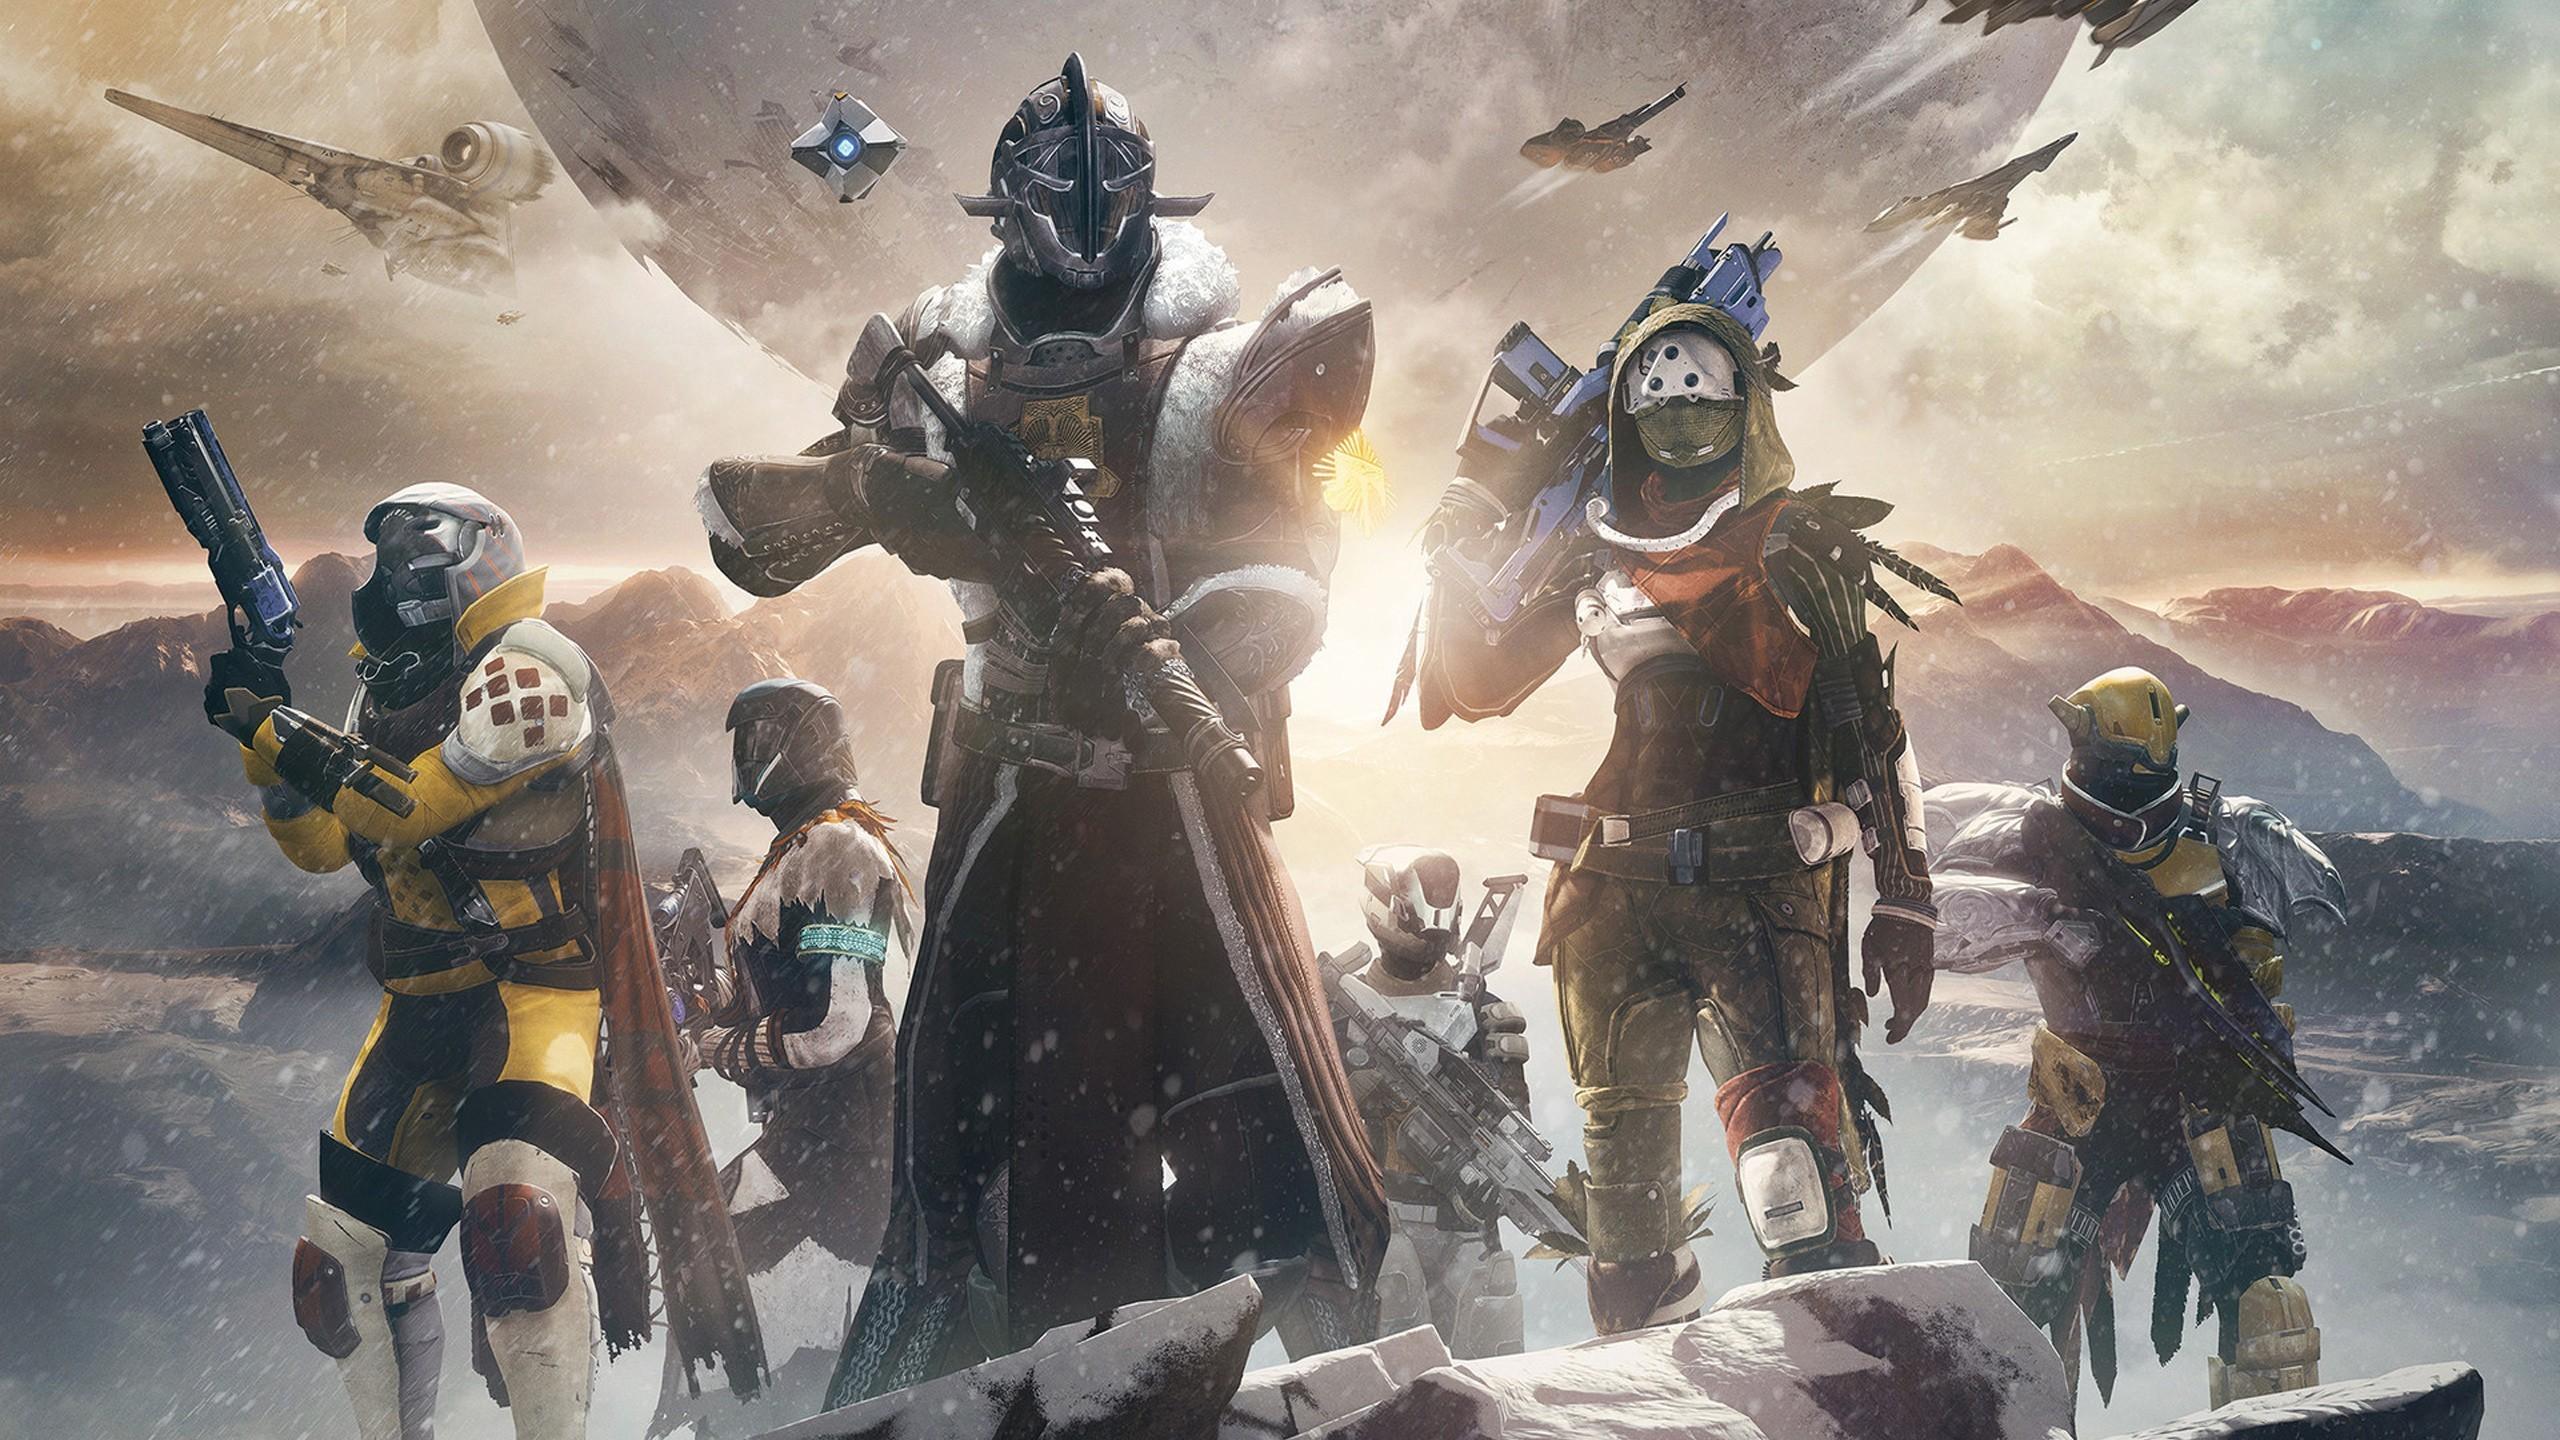 Description: Download Destiny The Collection 2017 Games wallpaper …